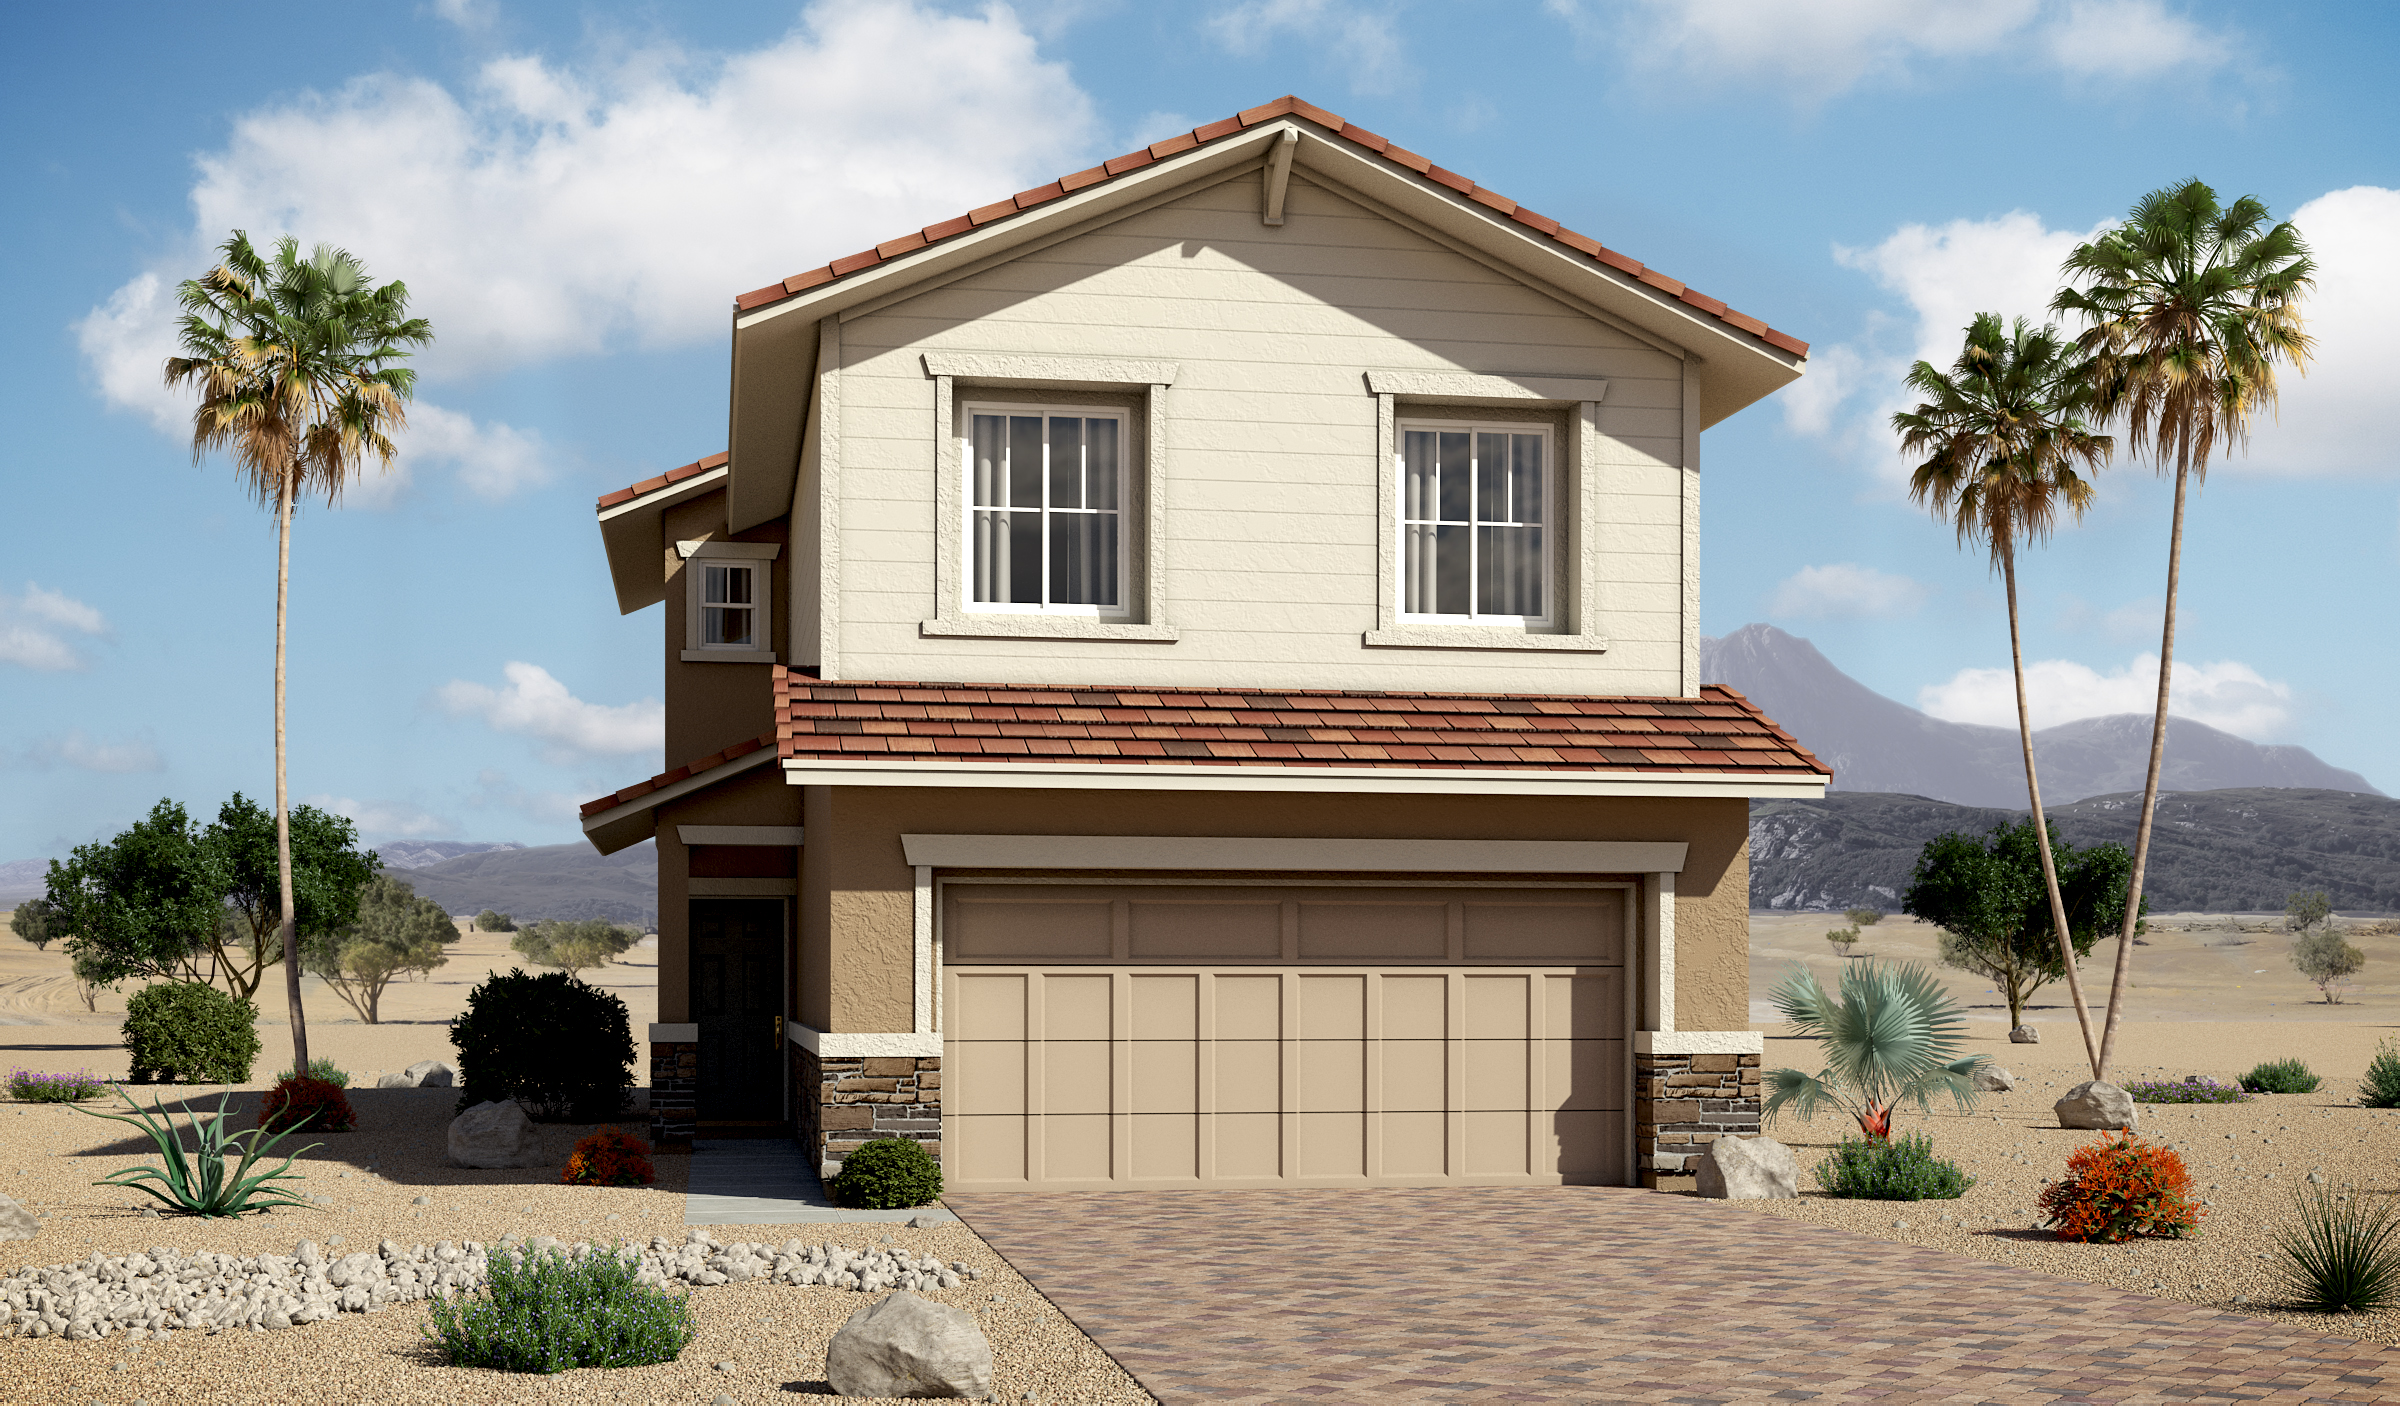 Acadia Home Builders  Contact Information